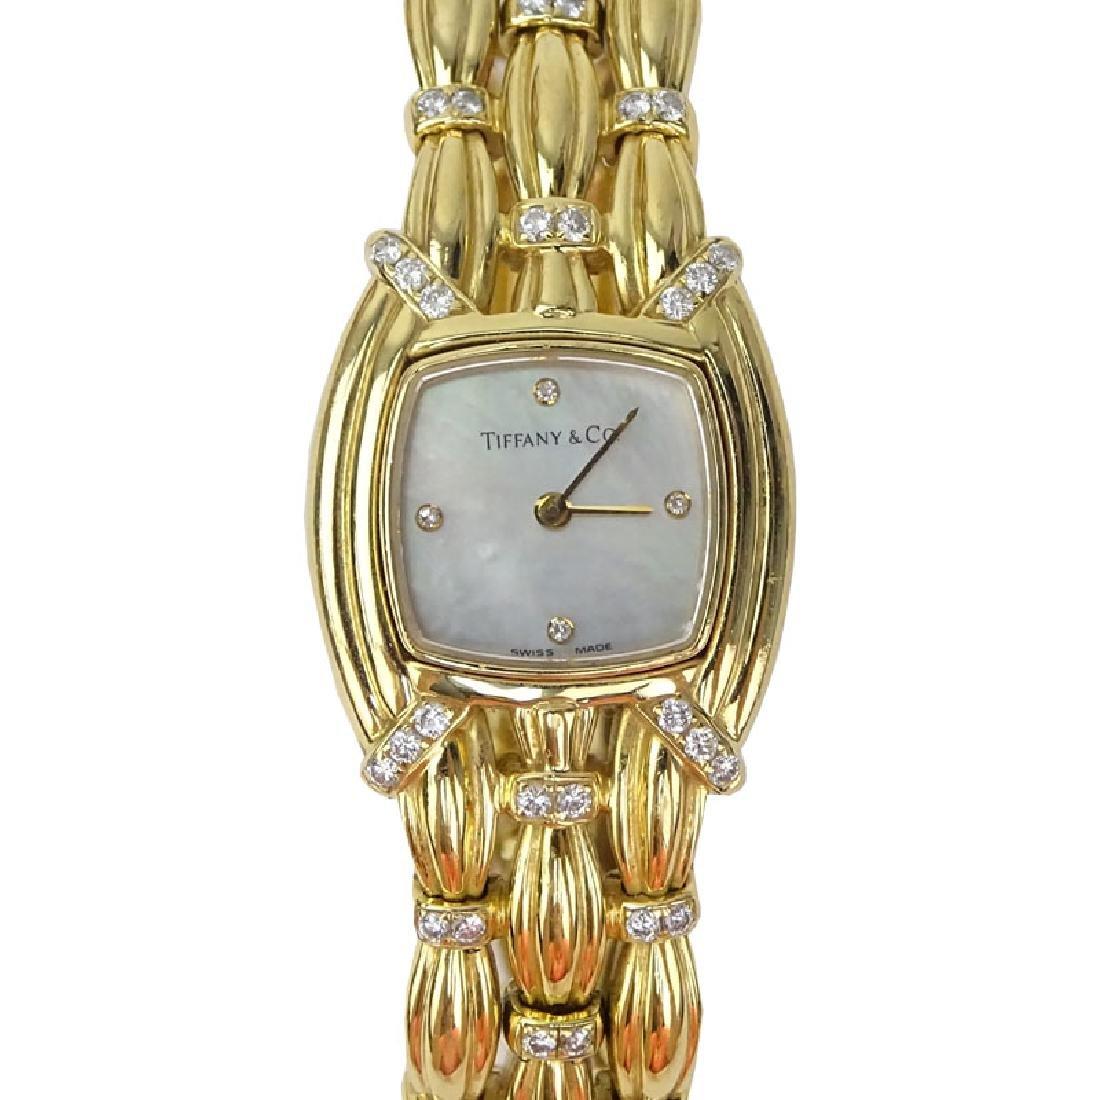 Tiffany & Co 18 Karat Yellow Gold and Diamond Signature